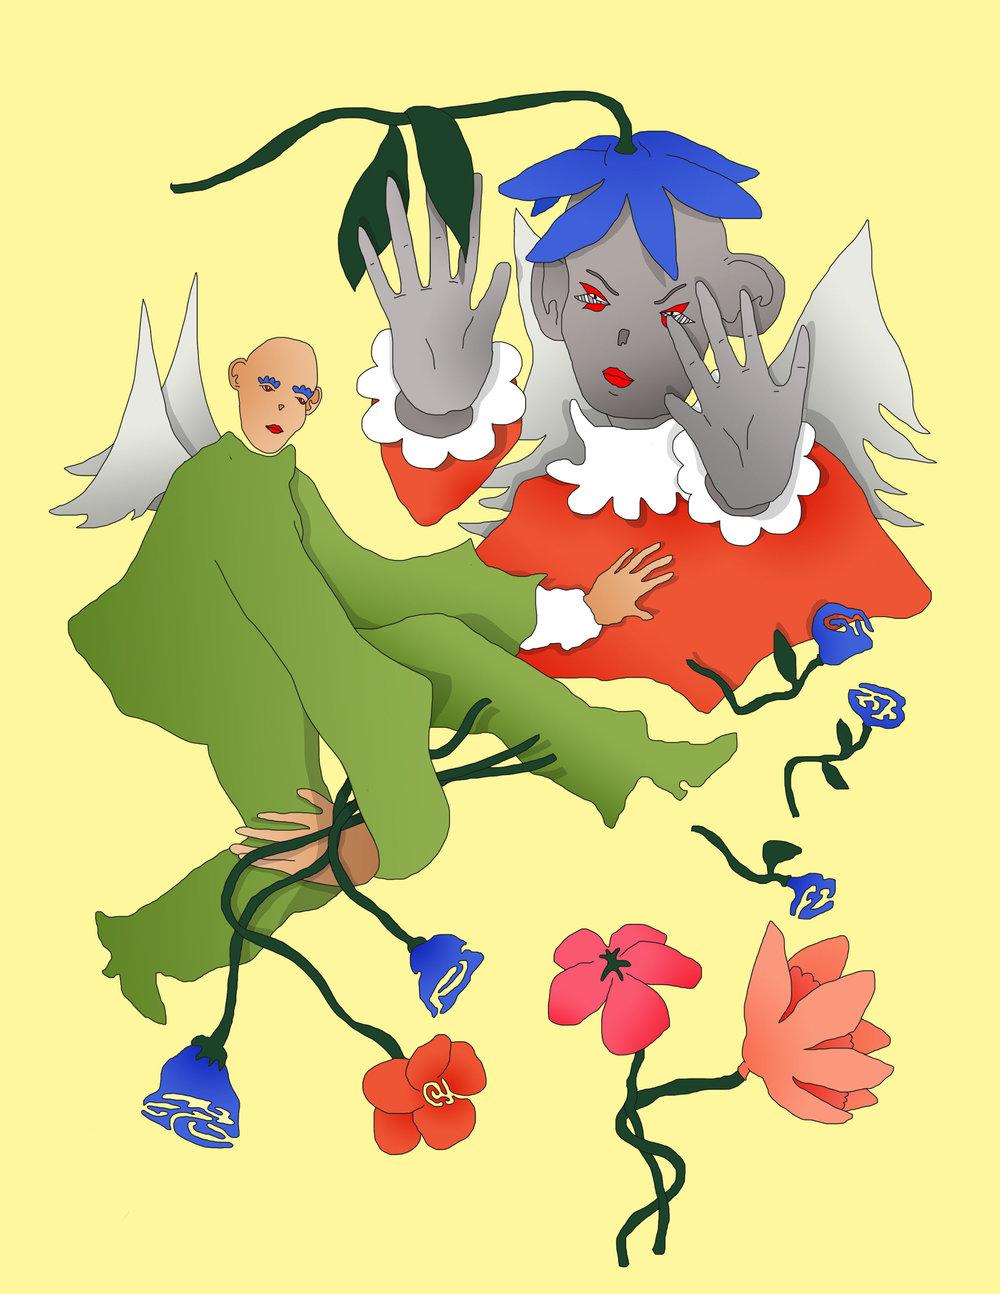 flowerclownflatcolour.jpg